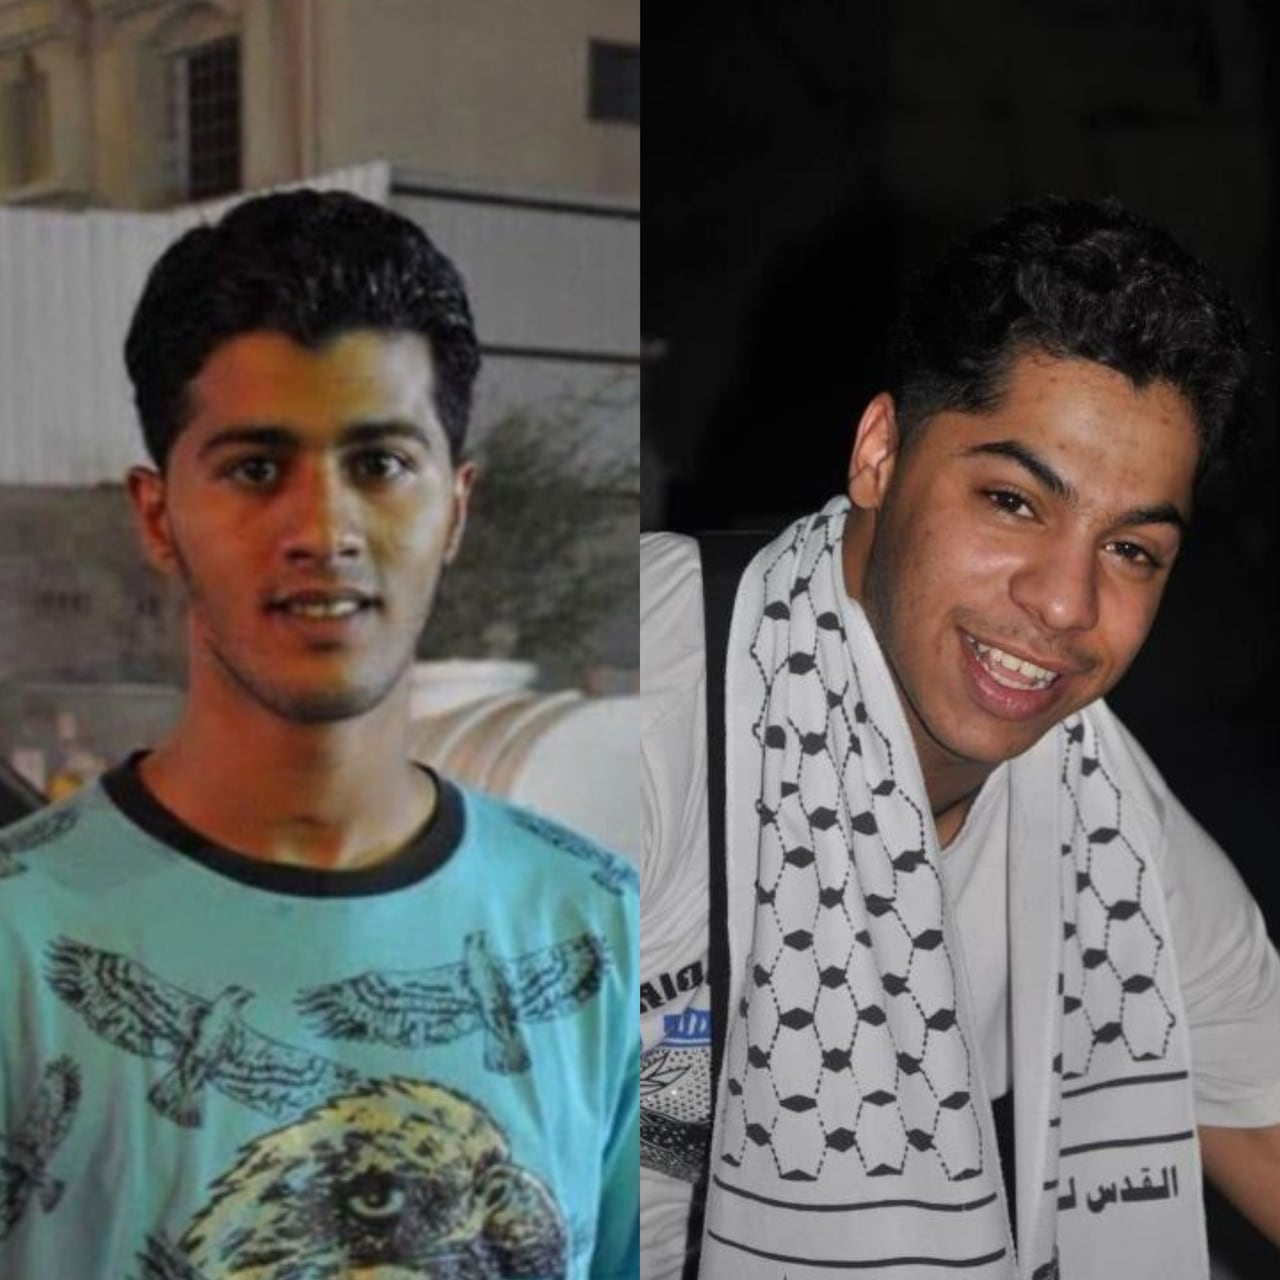 Saudi Arabia put these 2 men to death  Now their families